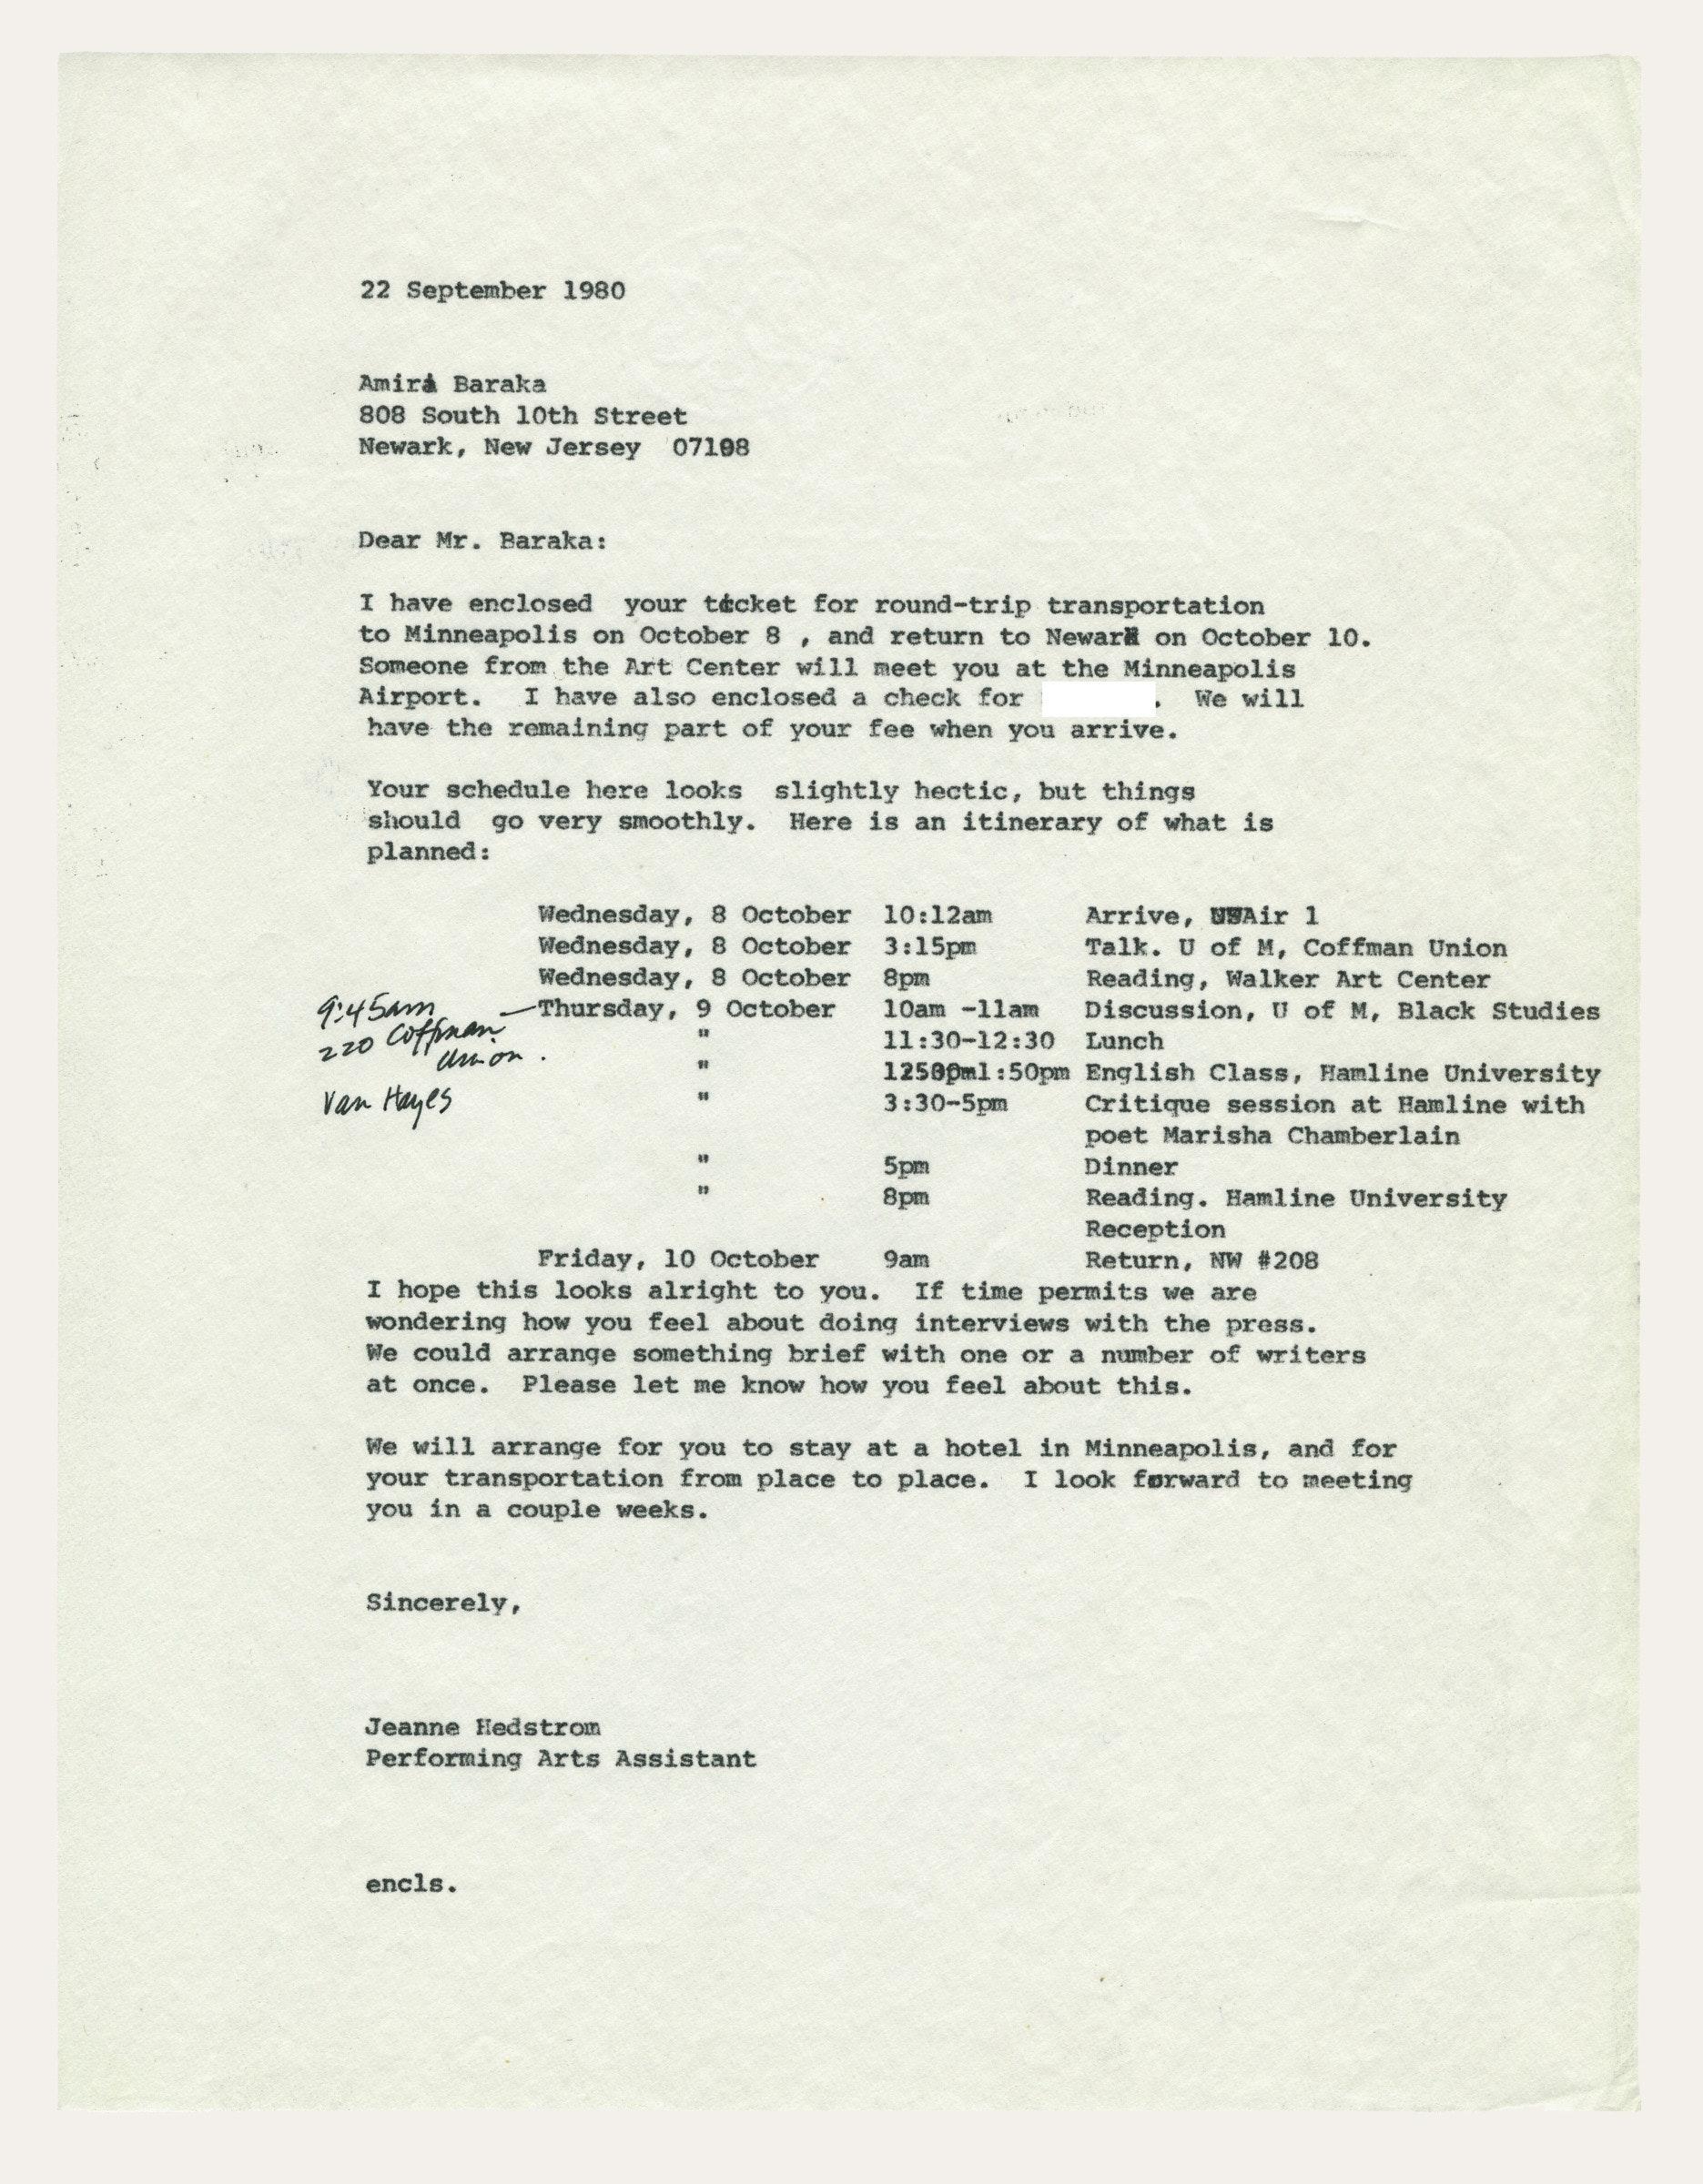 Scanned letter to Jeanne Hedstrom to Amiri Baraka